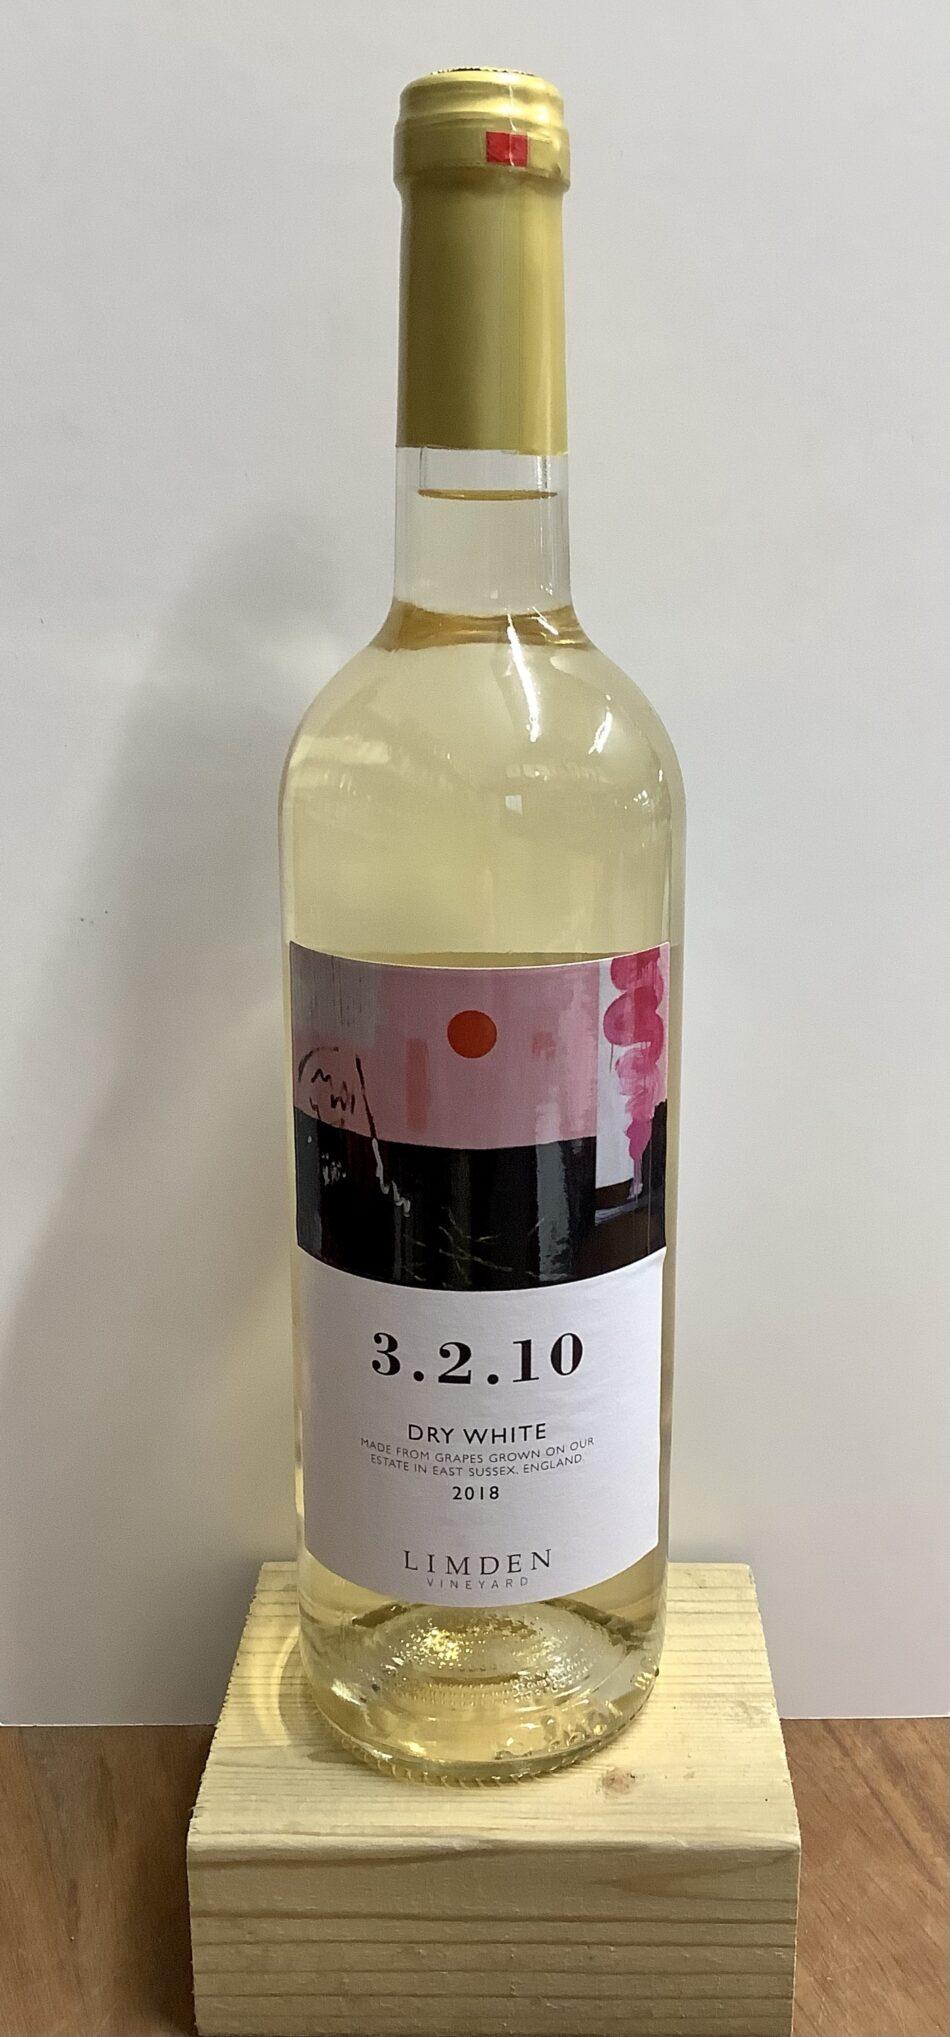 Limden Estate 3.2.10 White Wine 1